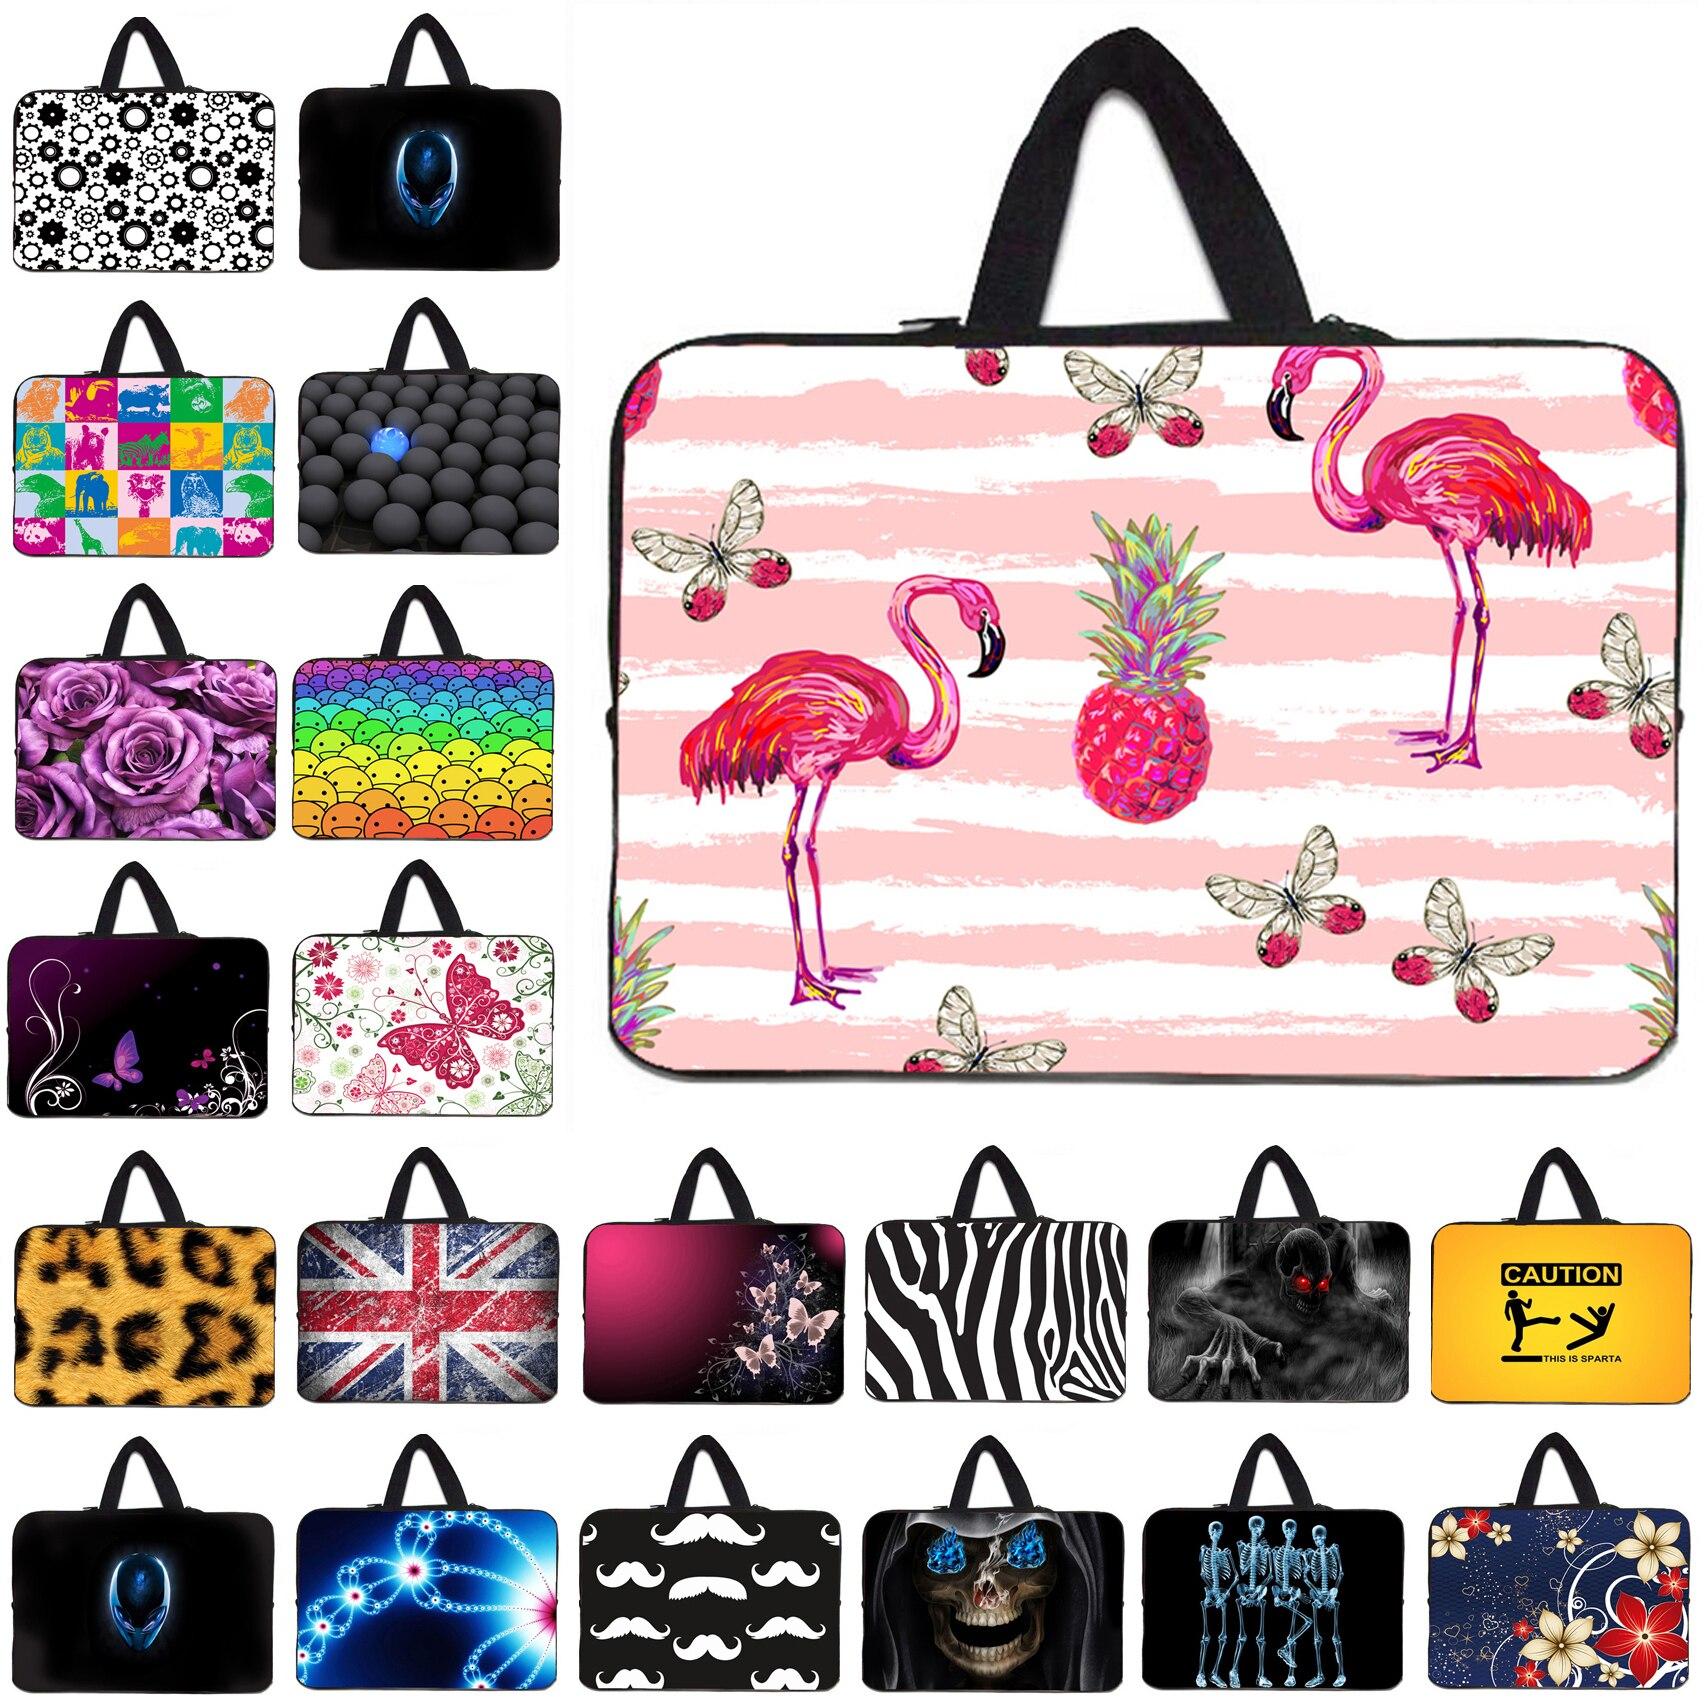 Tablet Netbook Nylon Inner Cases Bag For Women 10 10.1 12 13 13.3 14 15.4 15.6 17 inch Laptops Shell Pouch Bags For Macbook iPad